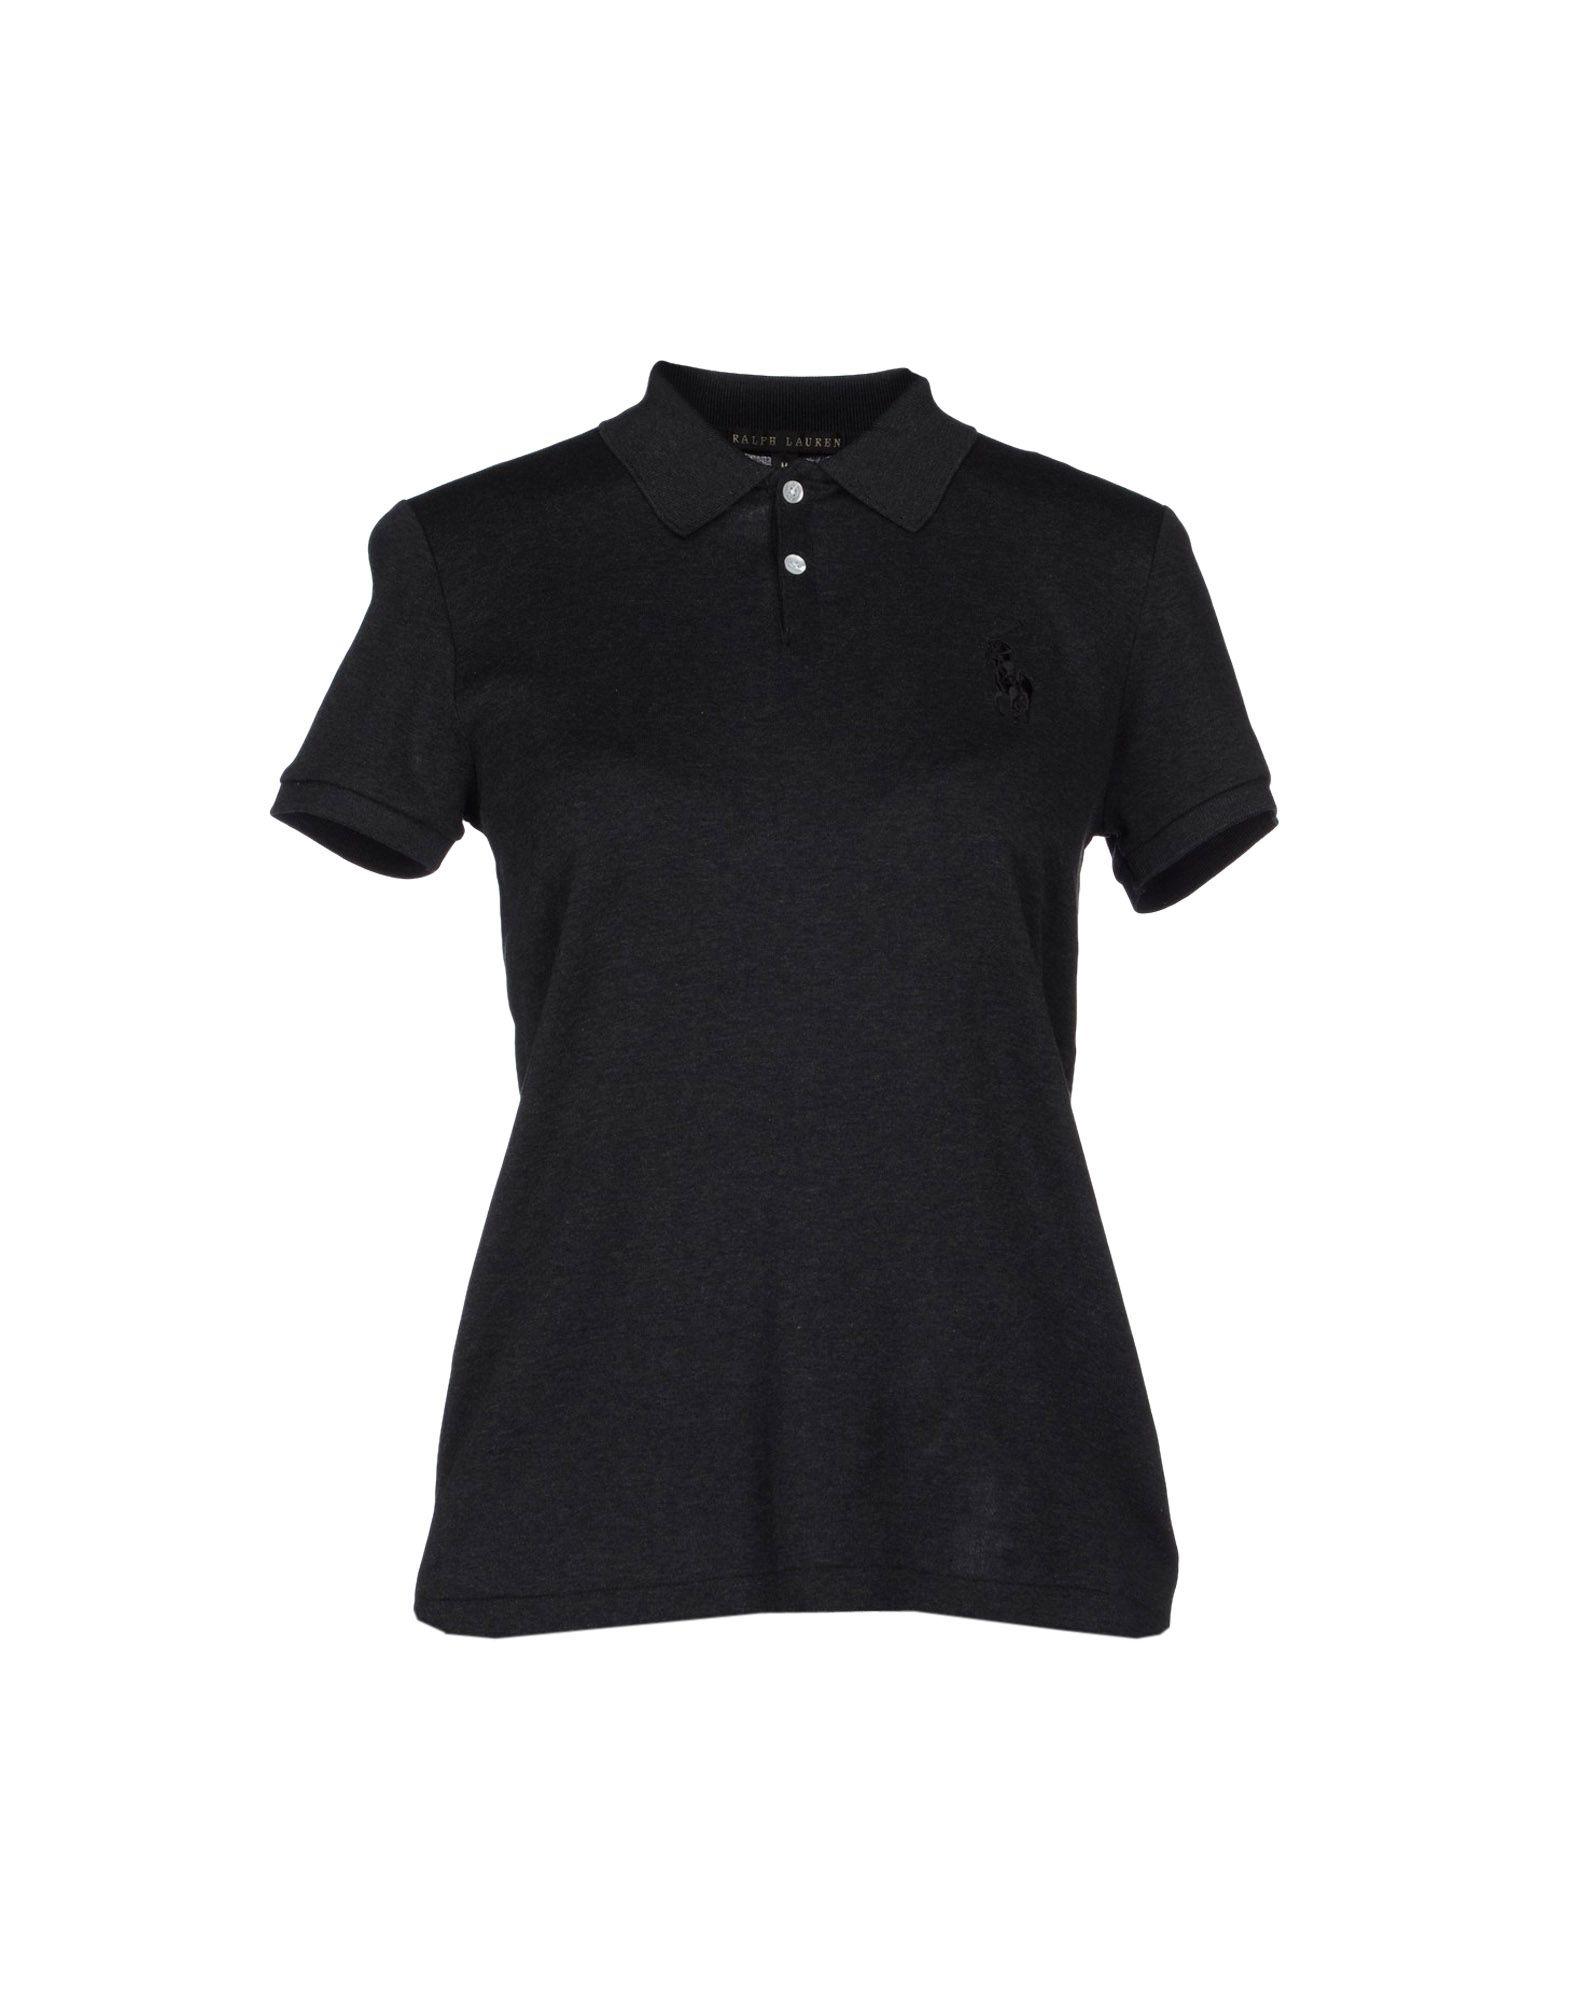 Ralph lauren black label polo shirt in gray steel grey for Ralph lauren black label polo shirt